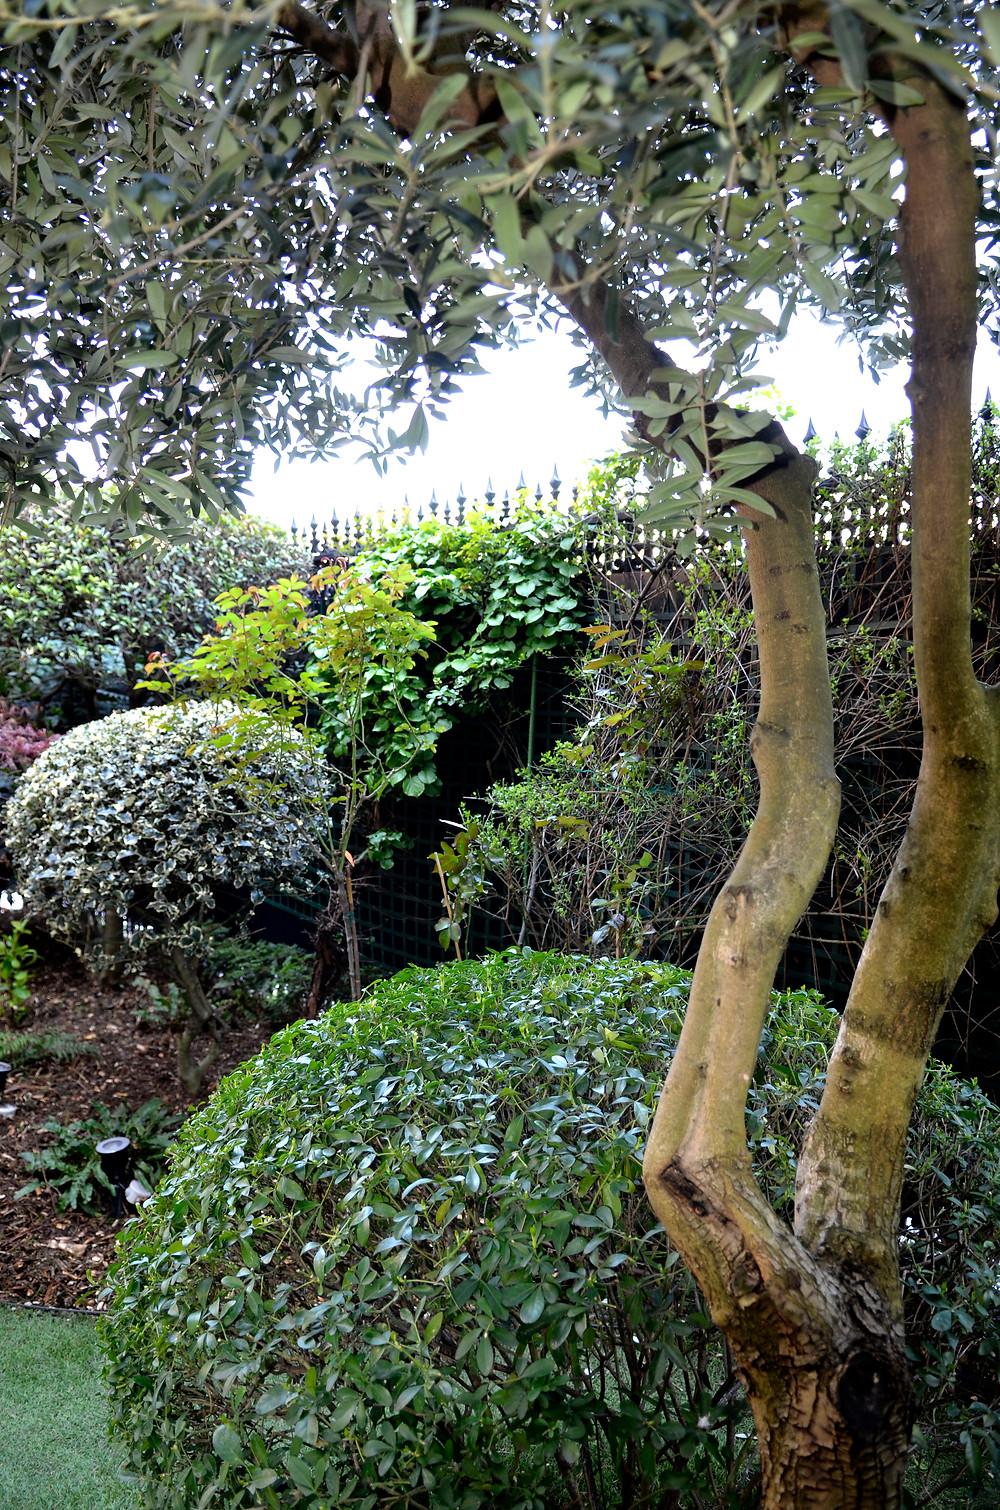 #paysagiste #gardendesign #citygarden #jardinsecret #instagardenlovers #urbangarden #urbanjungle #jardindeville #paris #creationjardin #natureinthecity #ecrindejardin #parisvert #greengarden #gardenlove #beauty #GardenGoals #garden #gardenstyle #landscapearchitecture #gardenparis